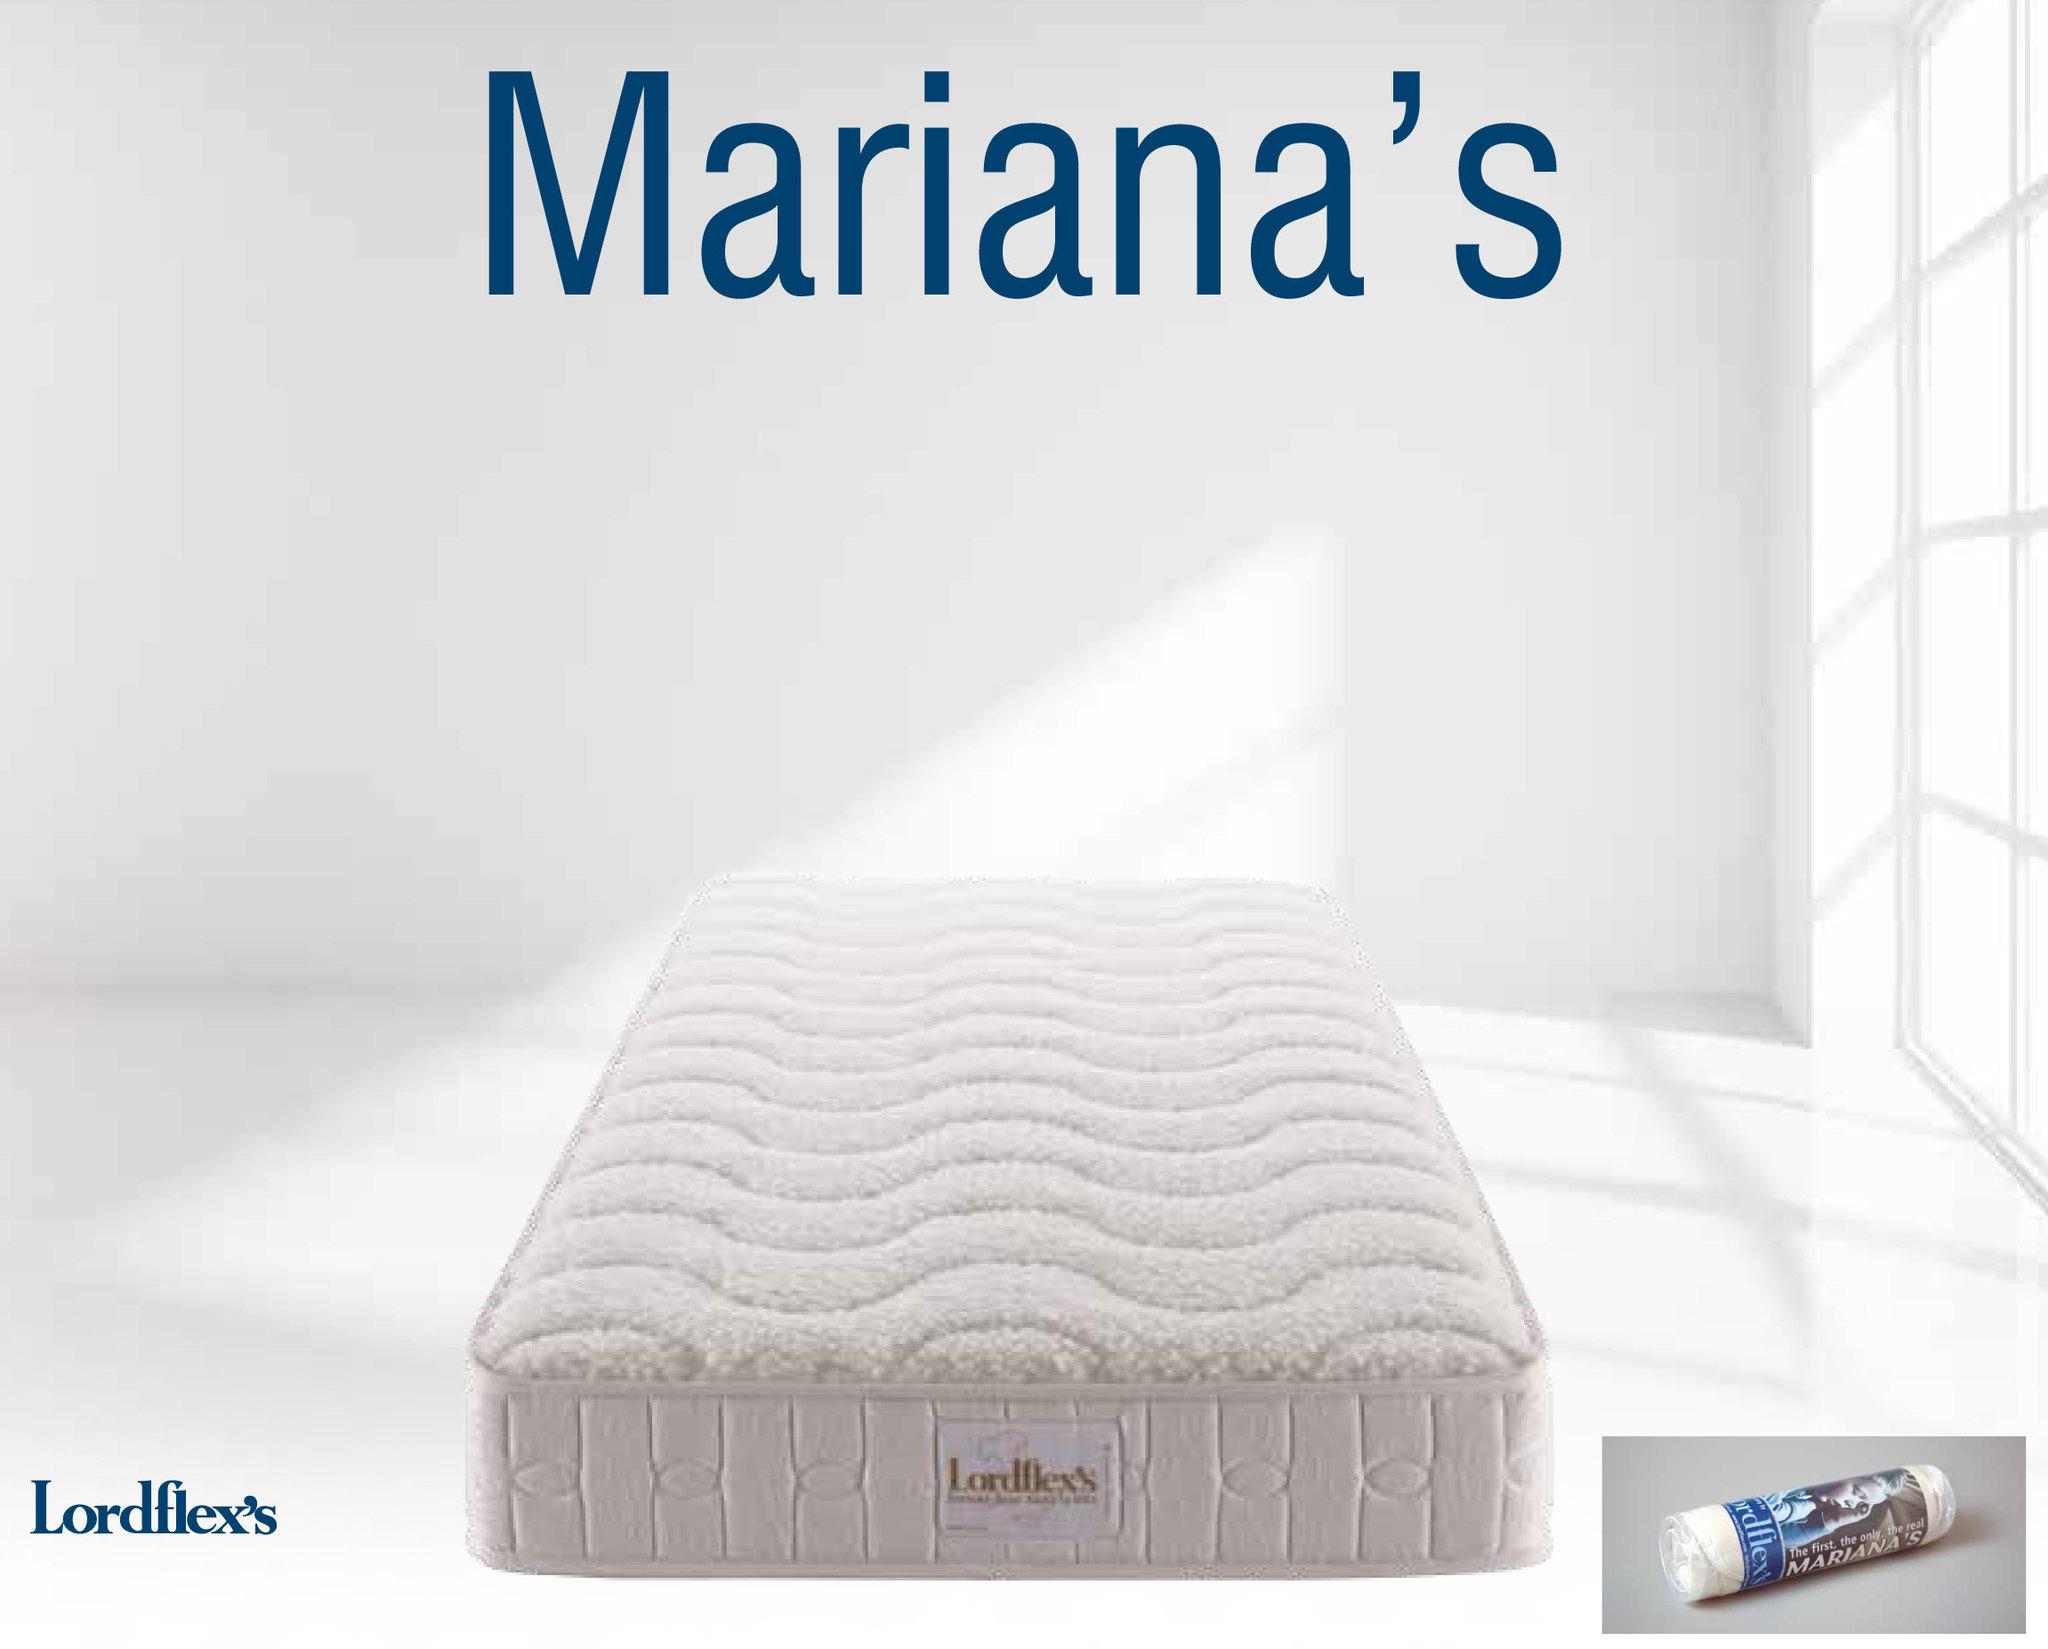 Матрасы Матрас ортопедический Lordflex's Mariana's 200х200 до 140 кг 1_Mariana_s.jpg